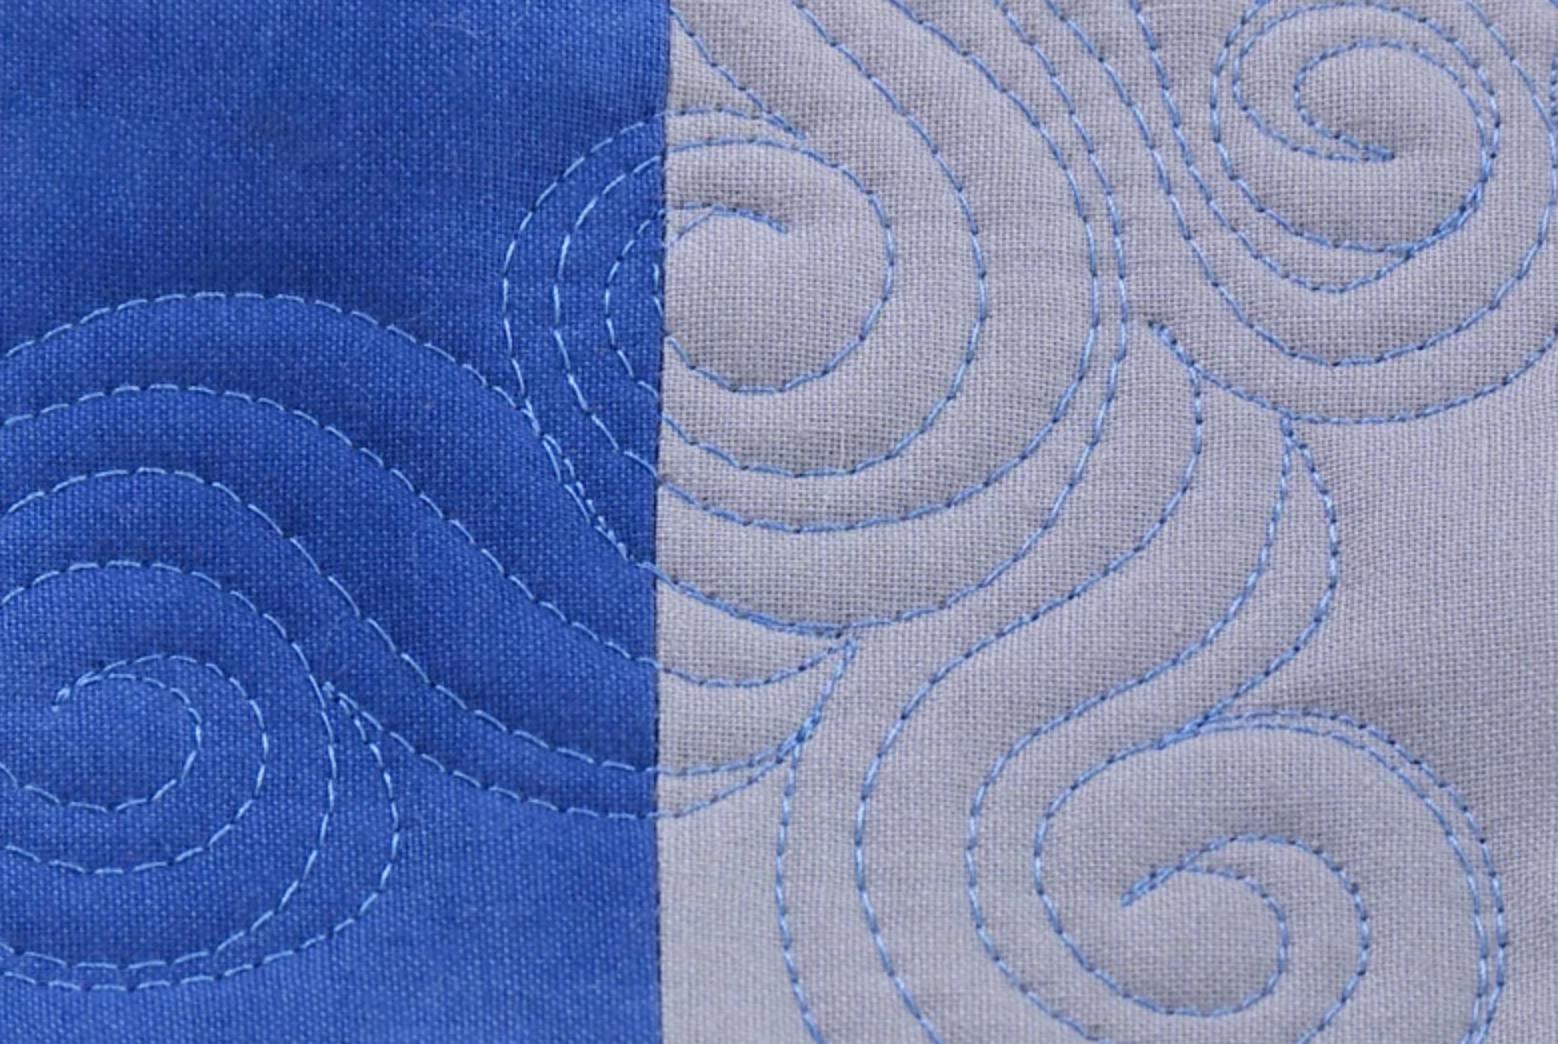 wavy line walking foot quilt pattern